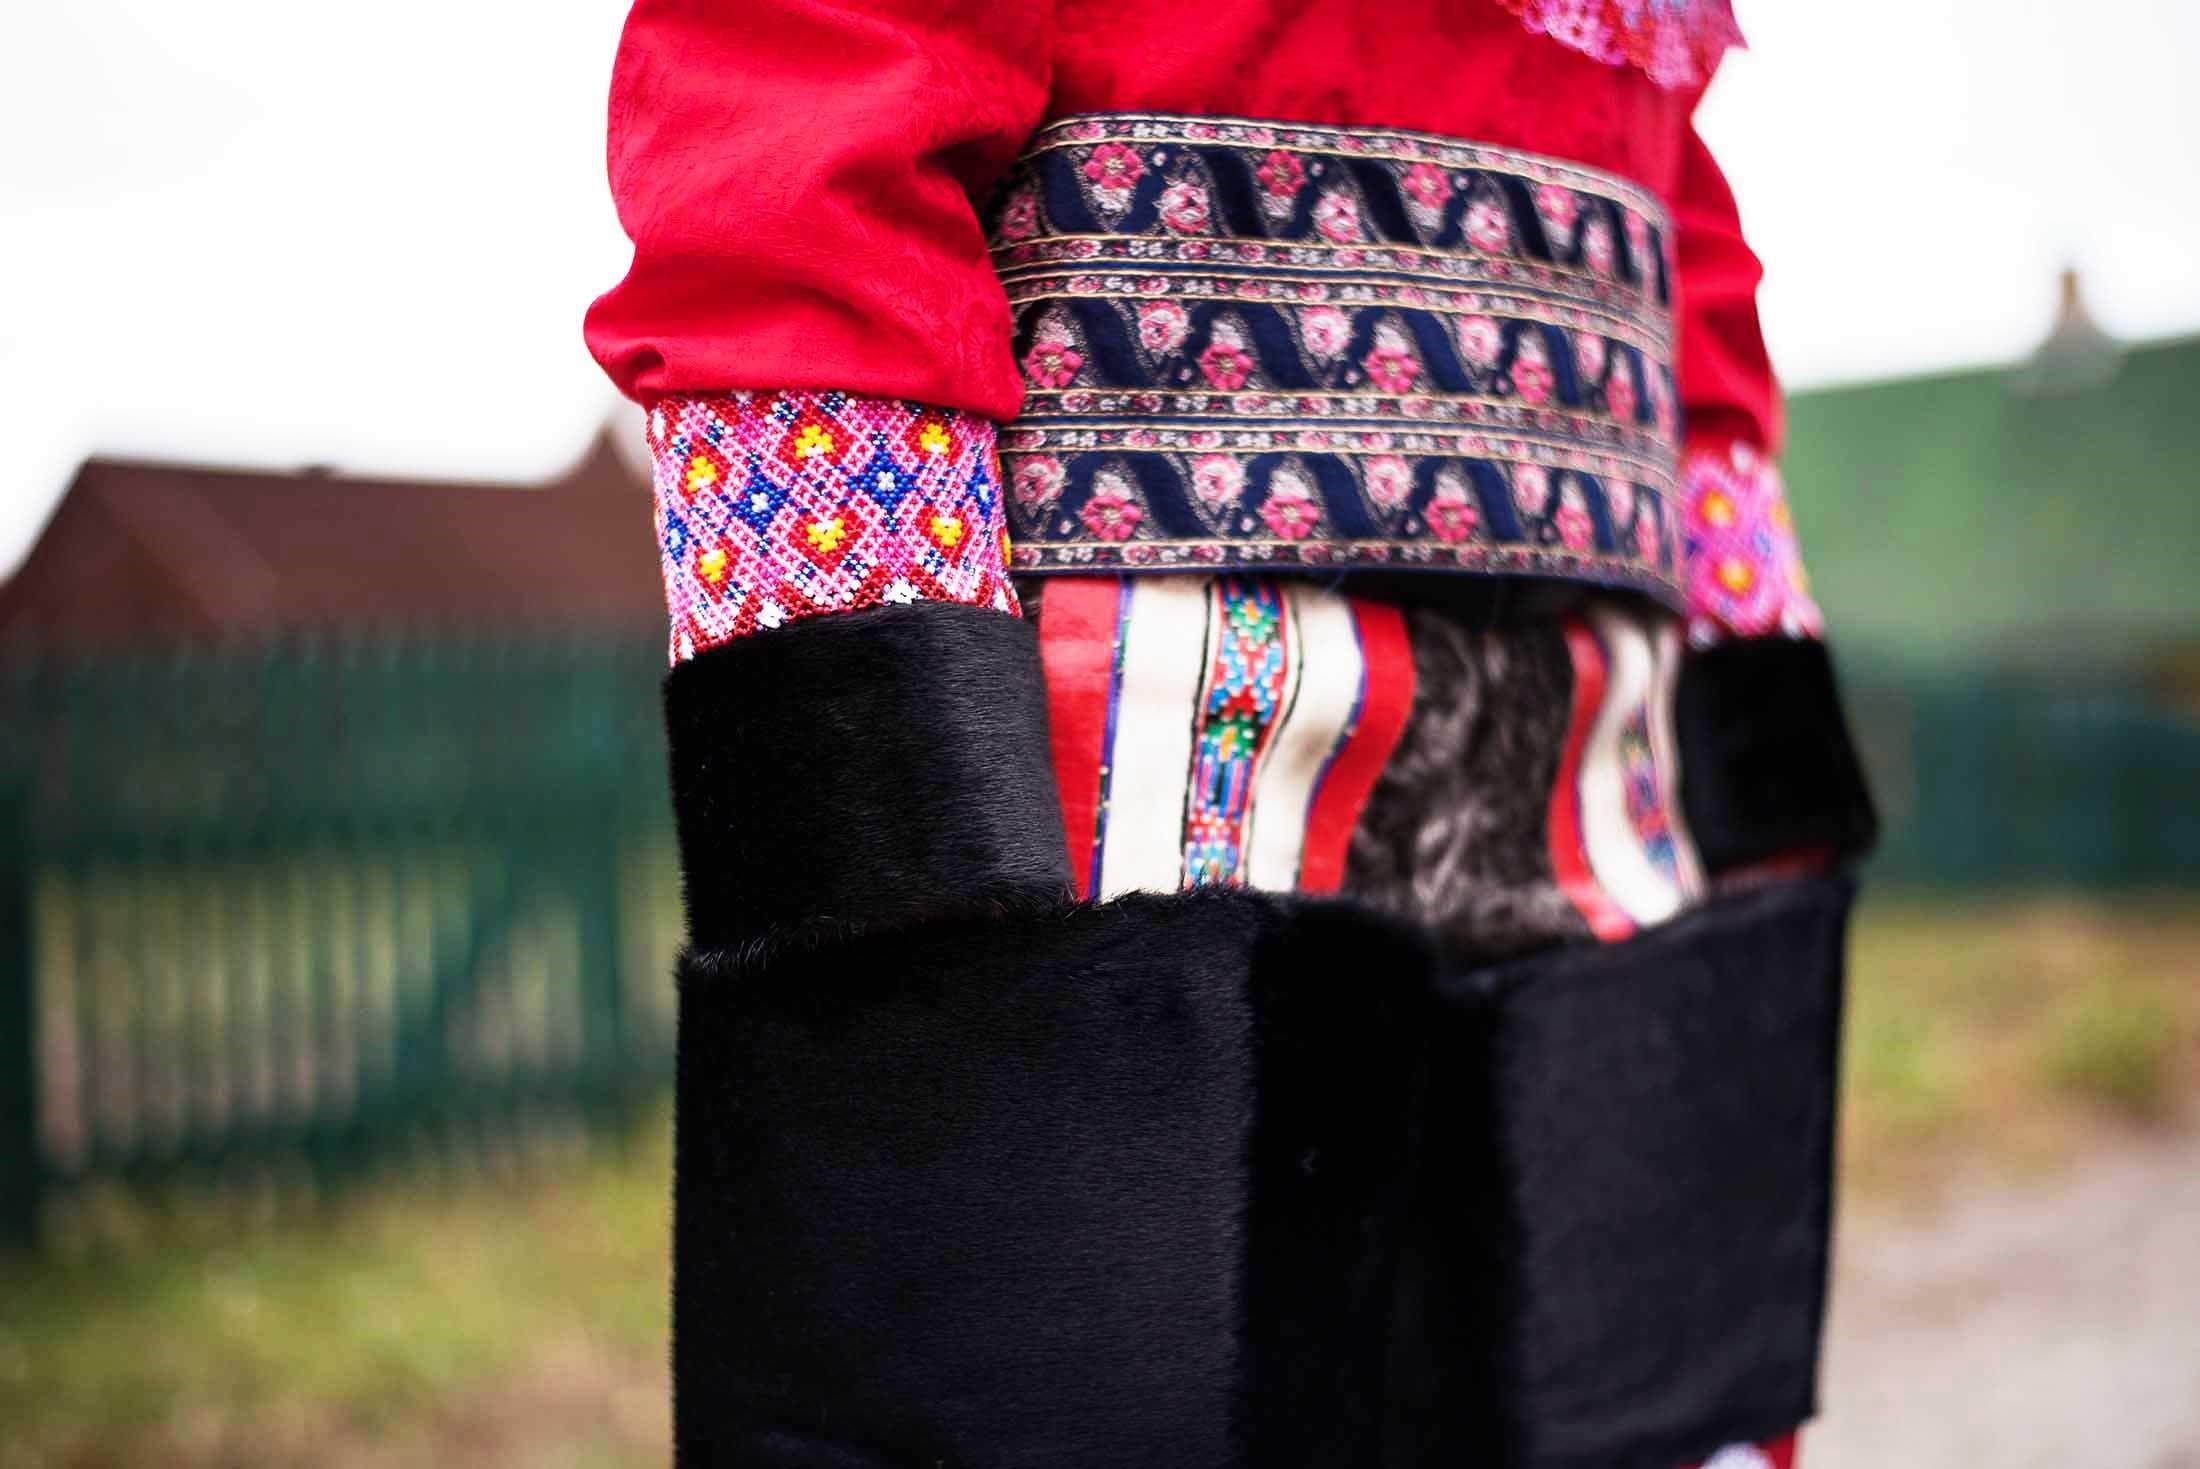 Traditional Greenlandic attire - Sisimiut, Greenland